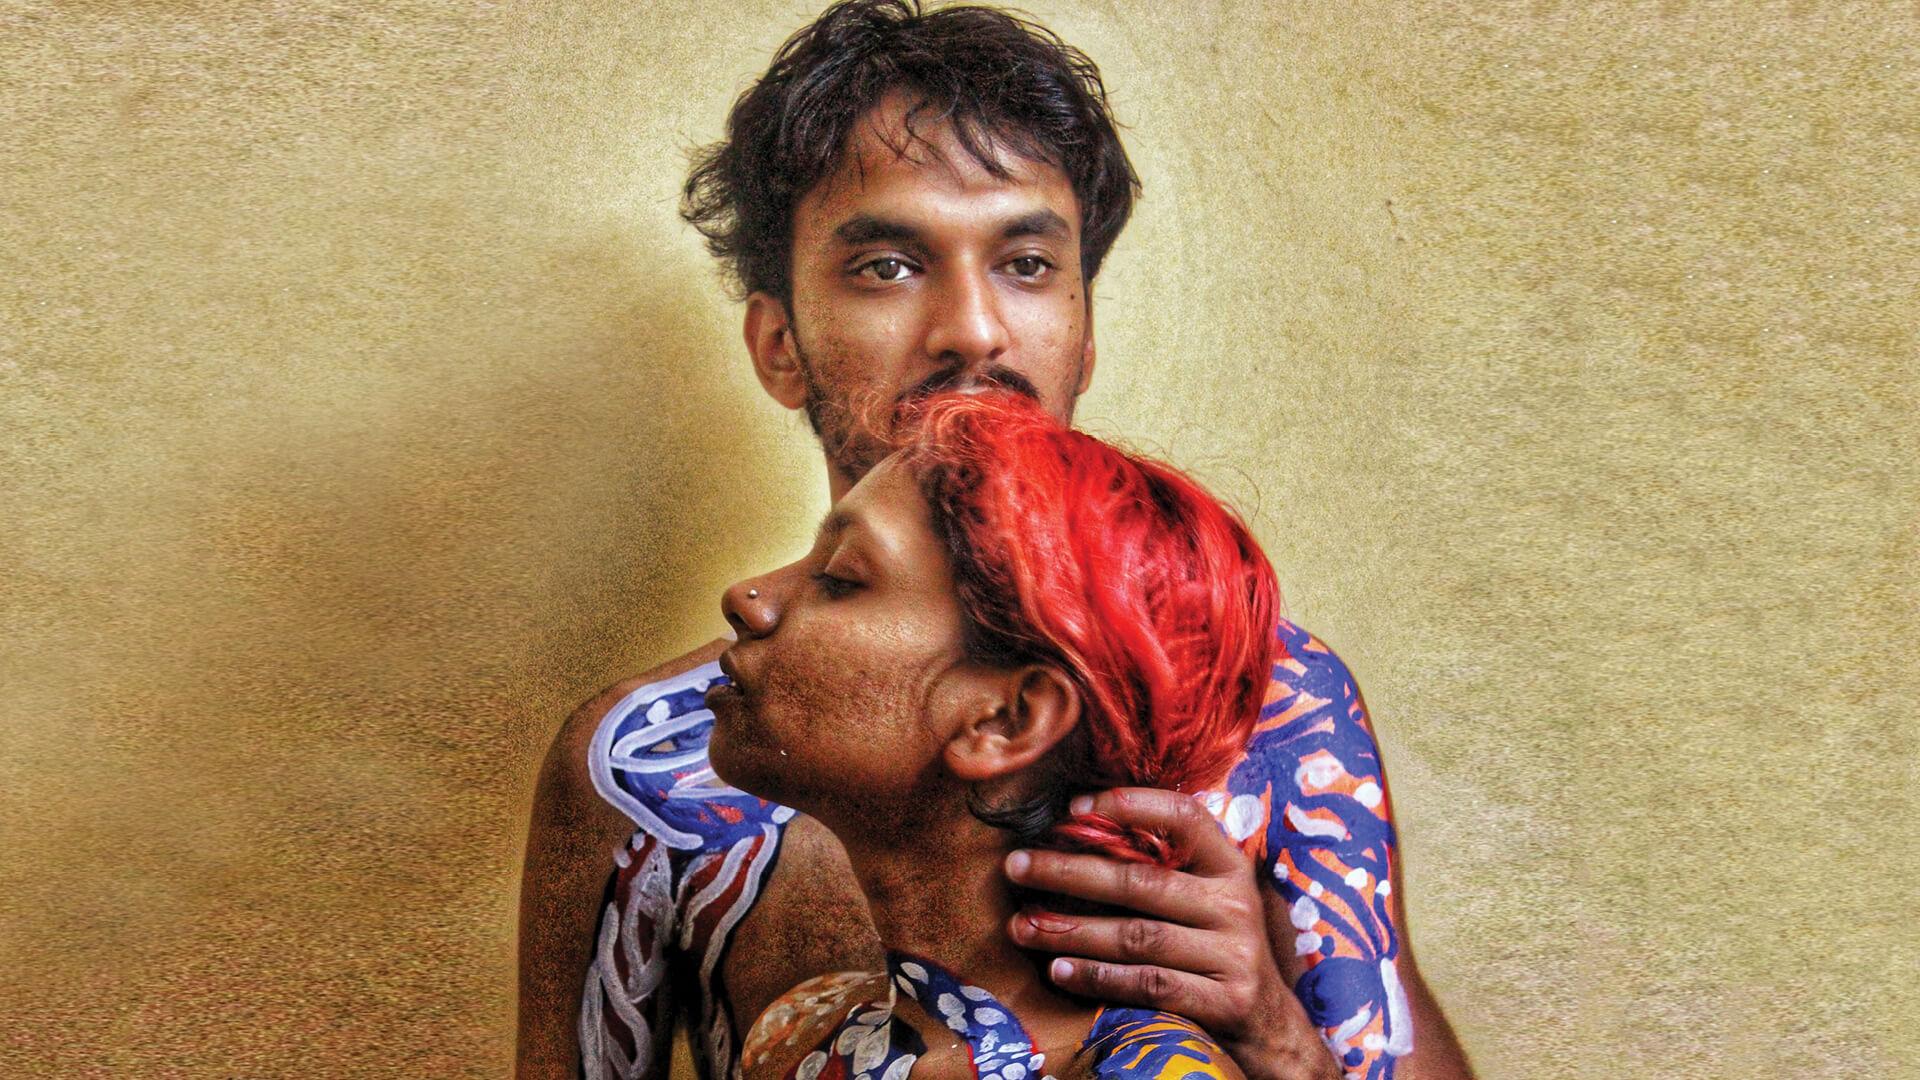 Ratyaditya Verma examines his body-based art practice, influences and inspirations